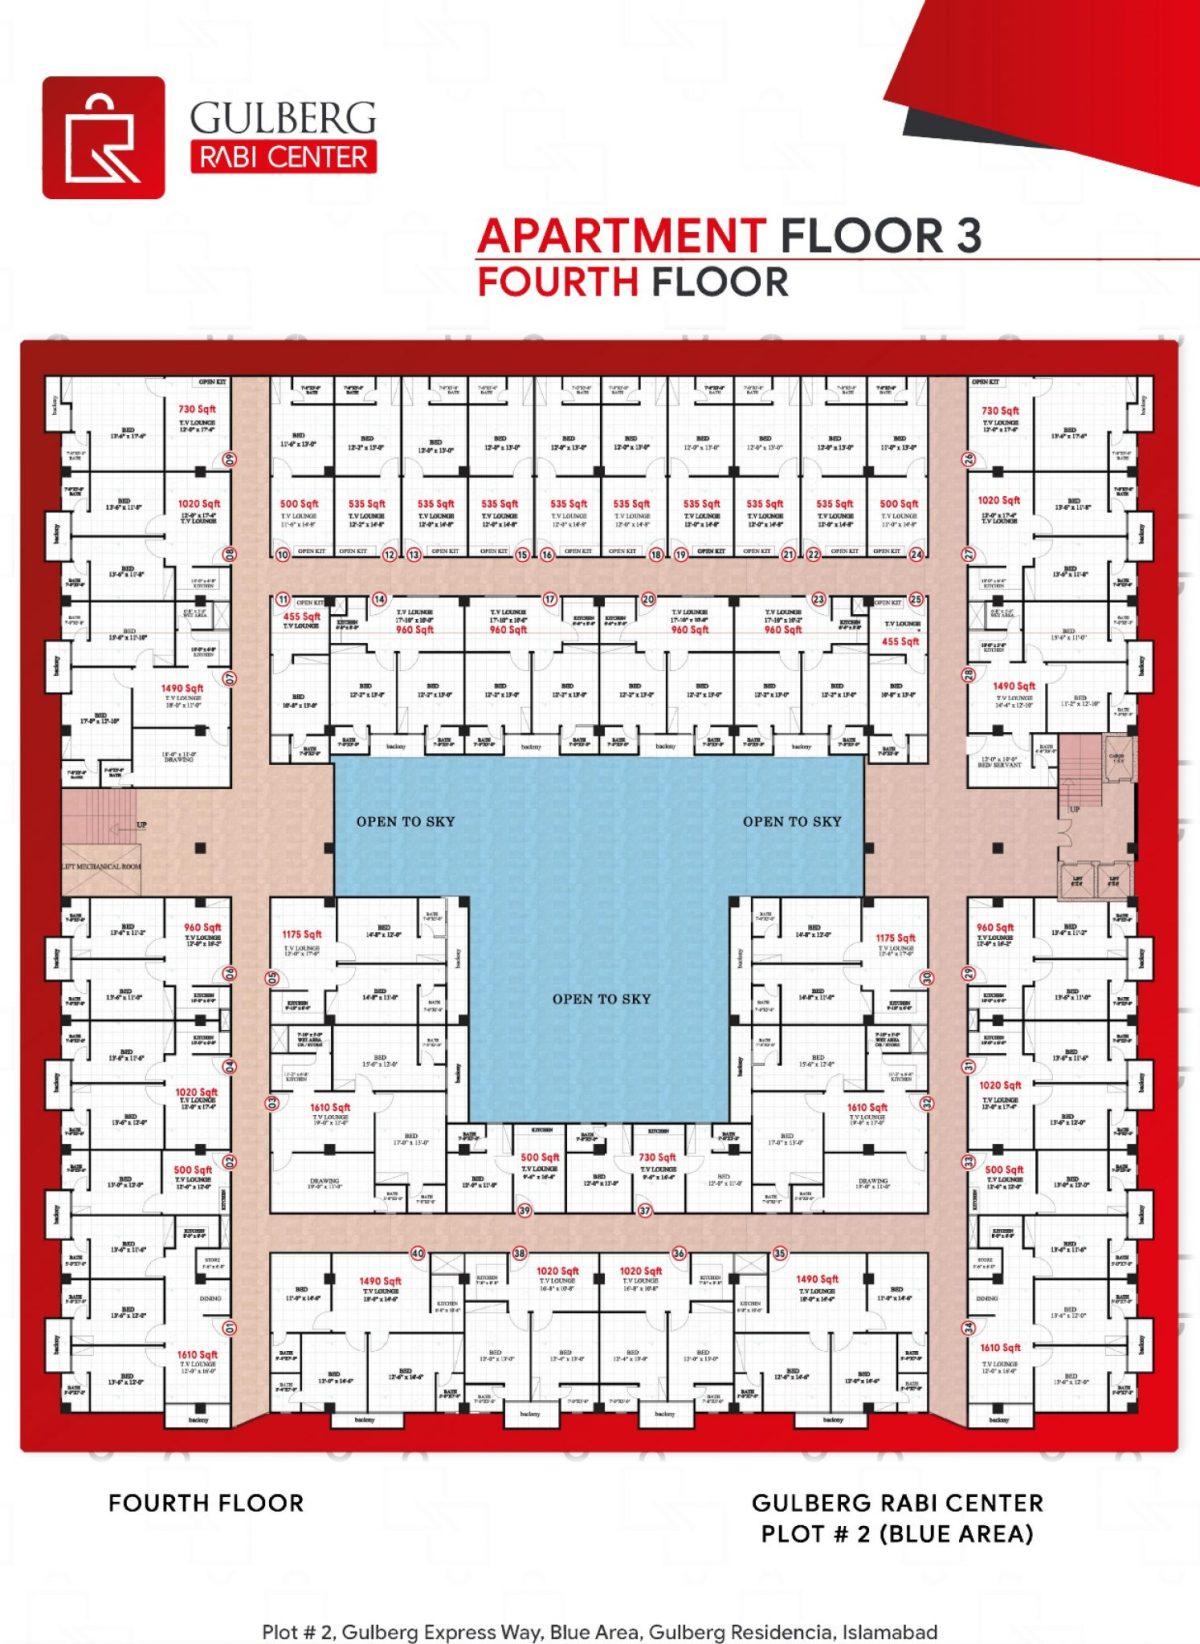 Floor Plan Apartment Floor 3 - (Fourth Floor)